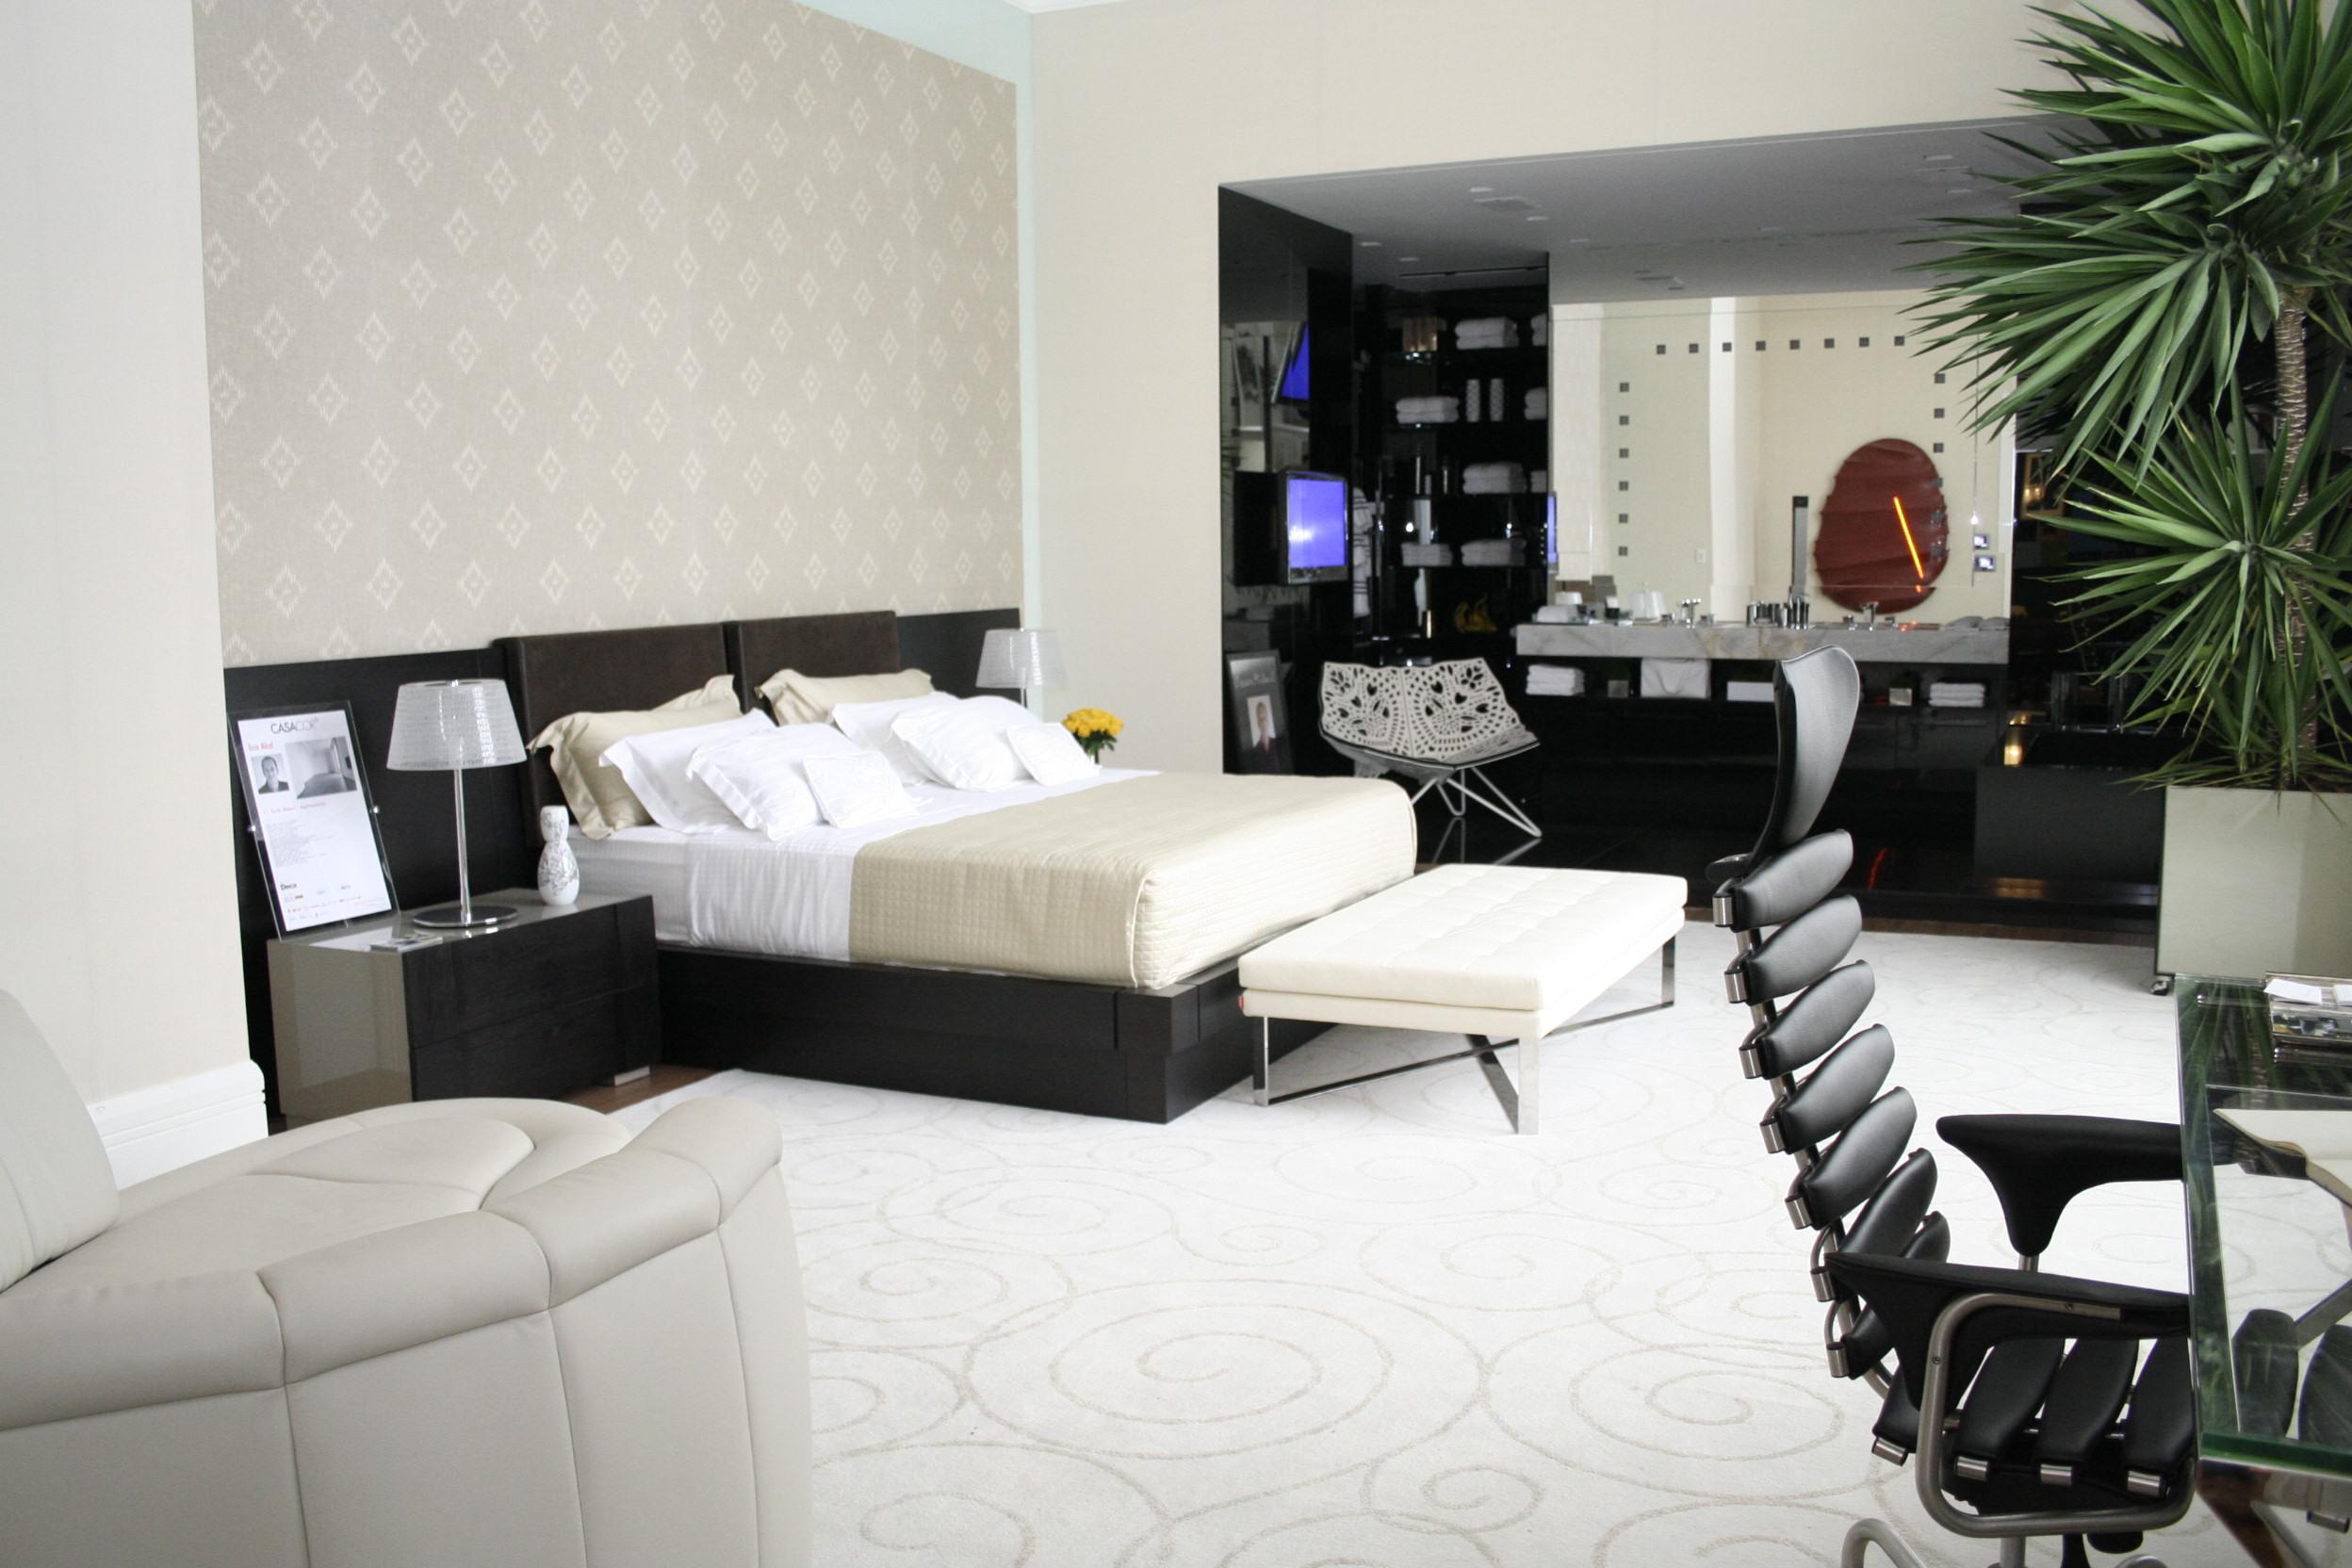 fotos decoracao de interiores de apartamentos : fotos decoracao de interiores de apartamentos:dicas-de-decoracao-de-quarto-casa-cor-2009-suite-master-apartamento